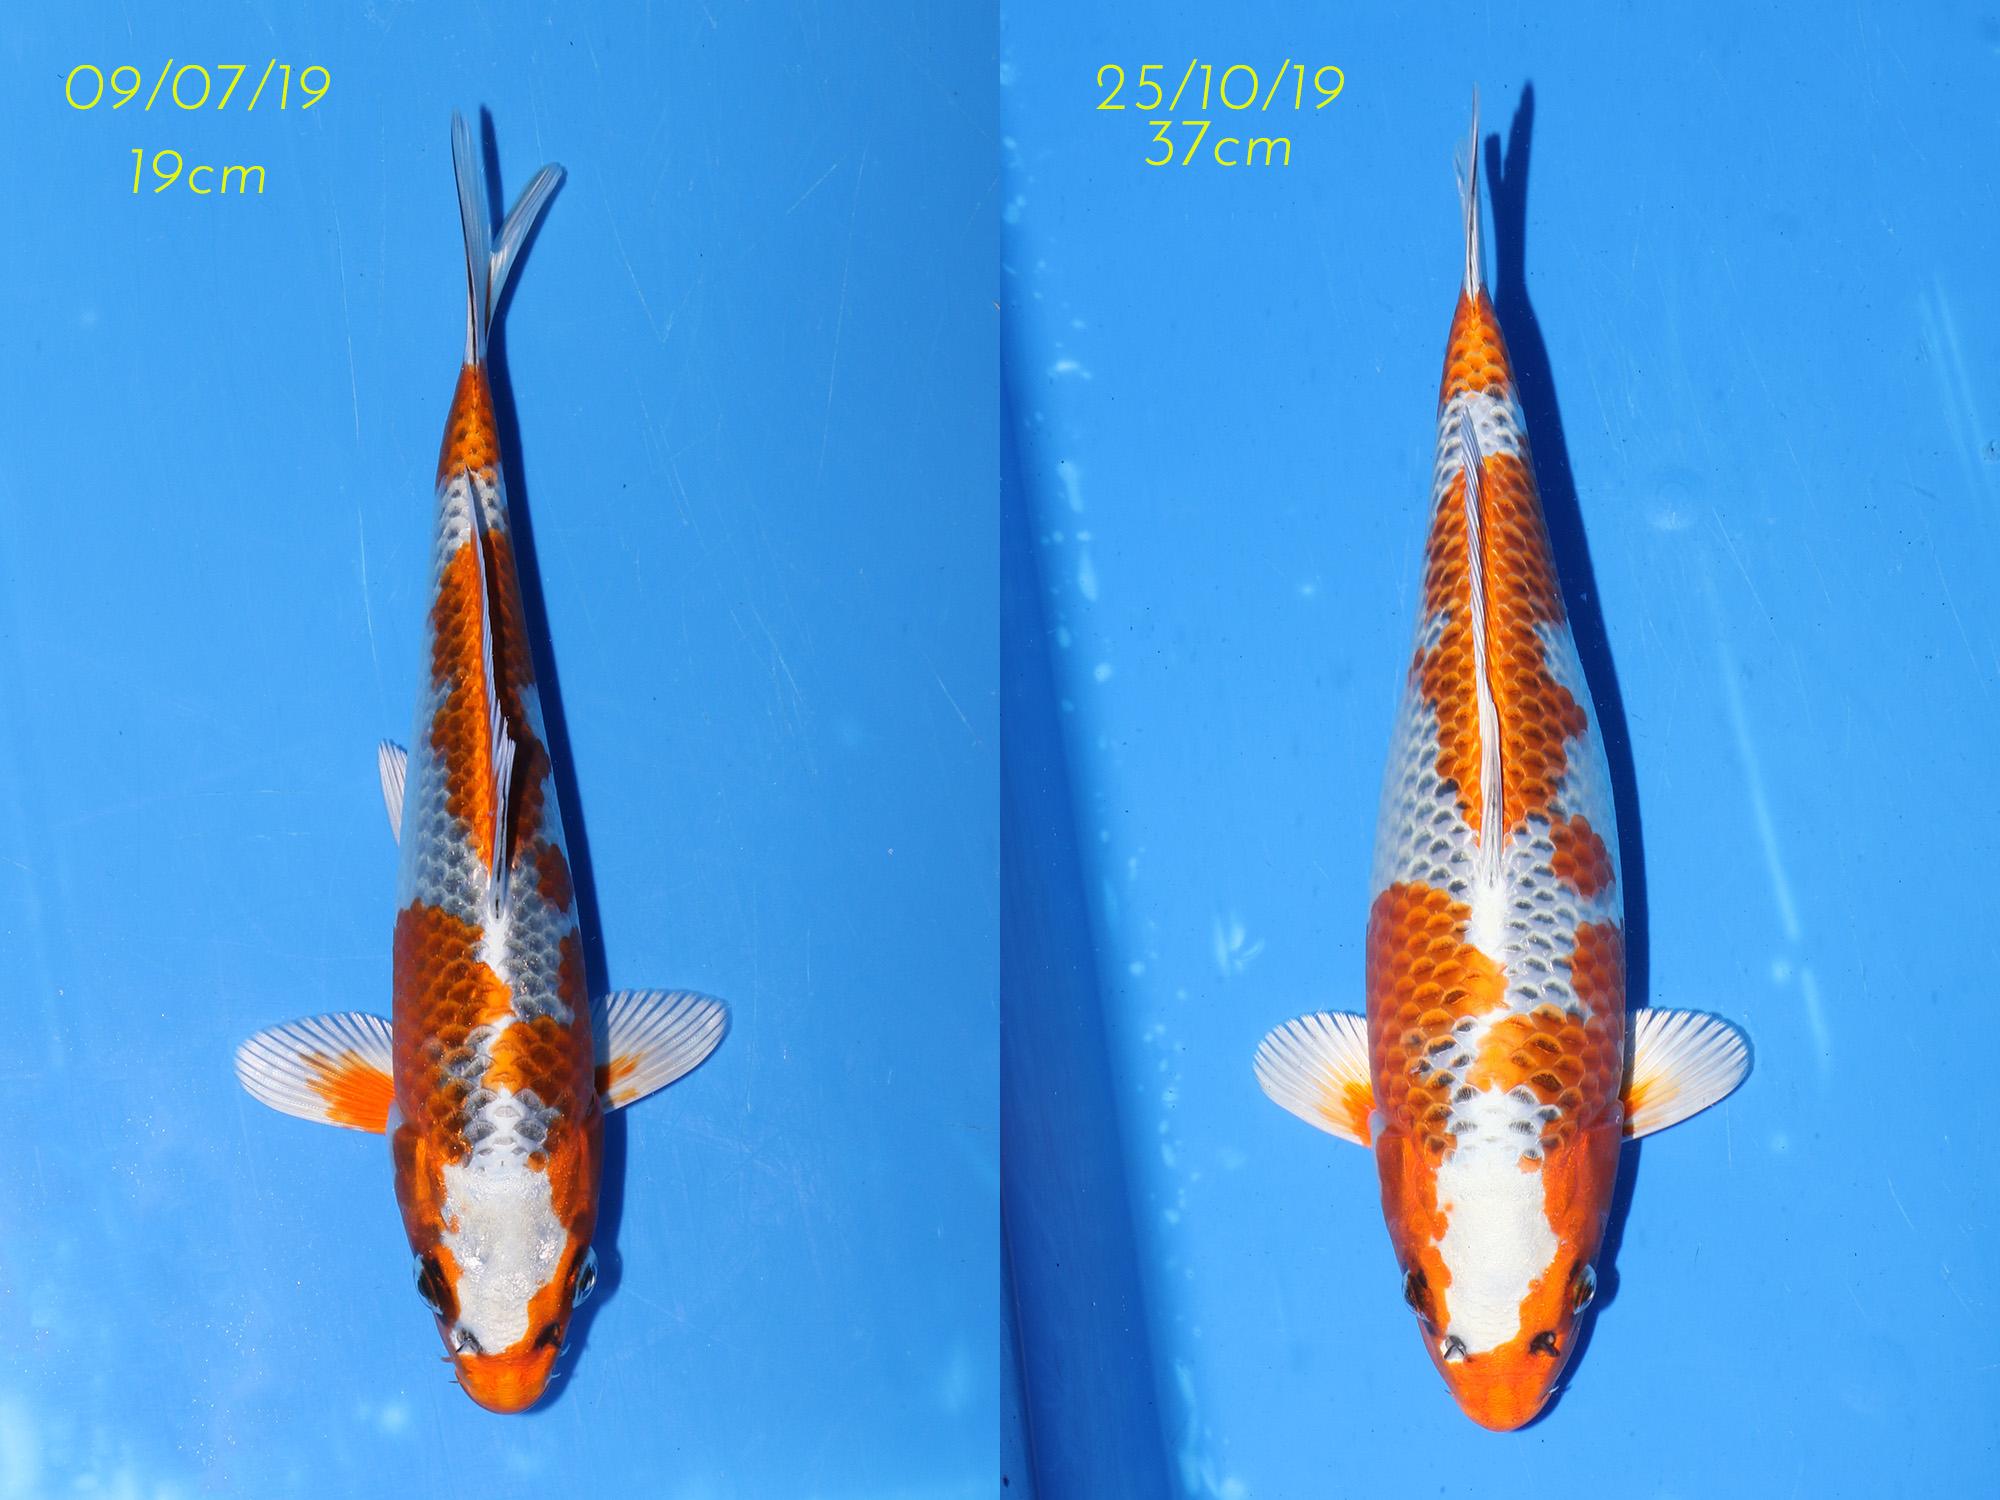 Kujaku_1_Comparison.jpg